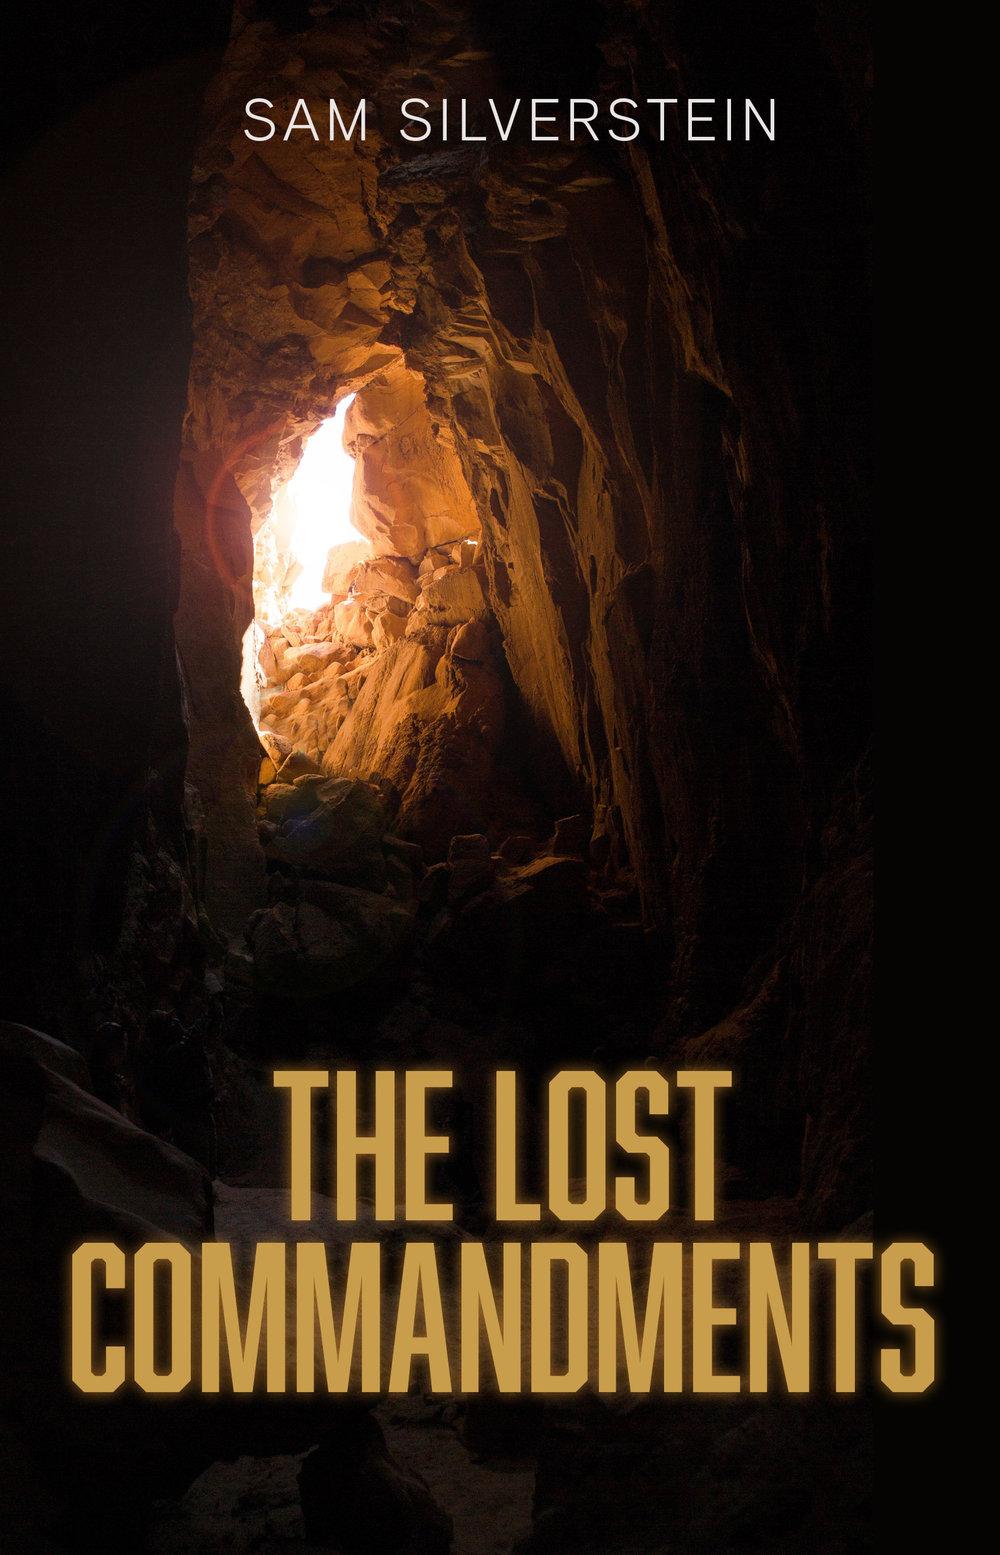 The Lost Commandments - Sam Silverstein